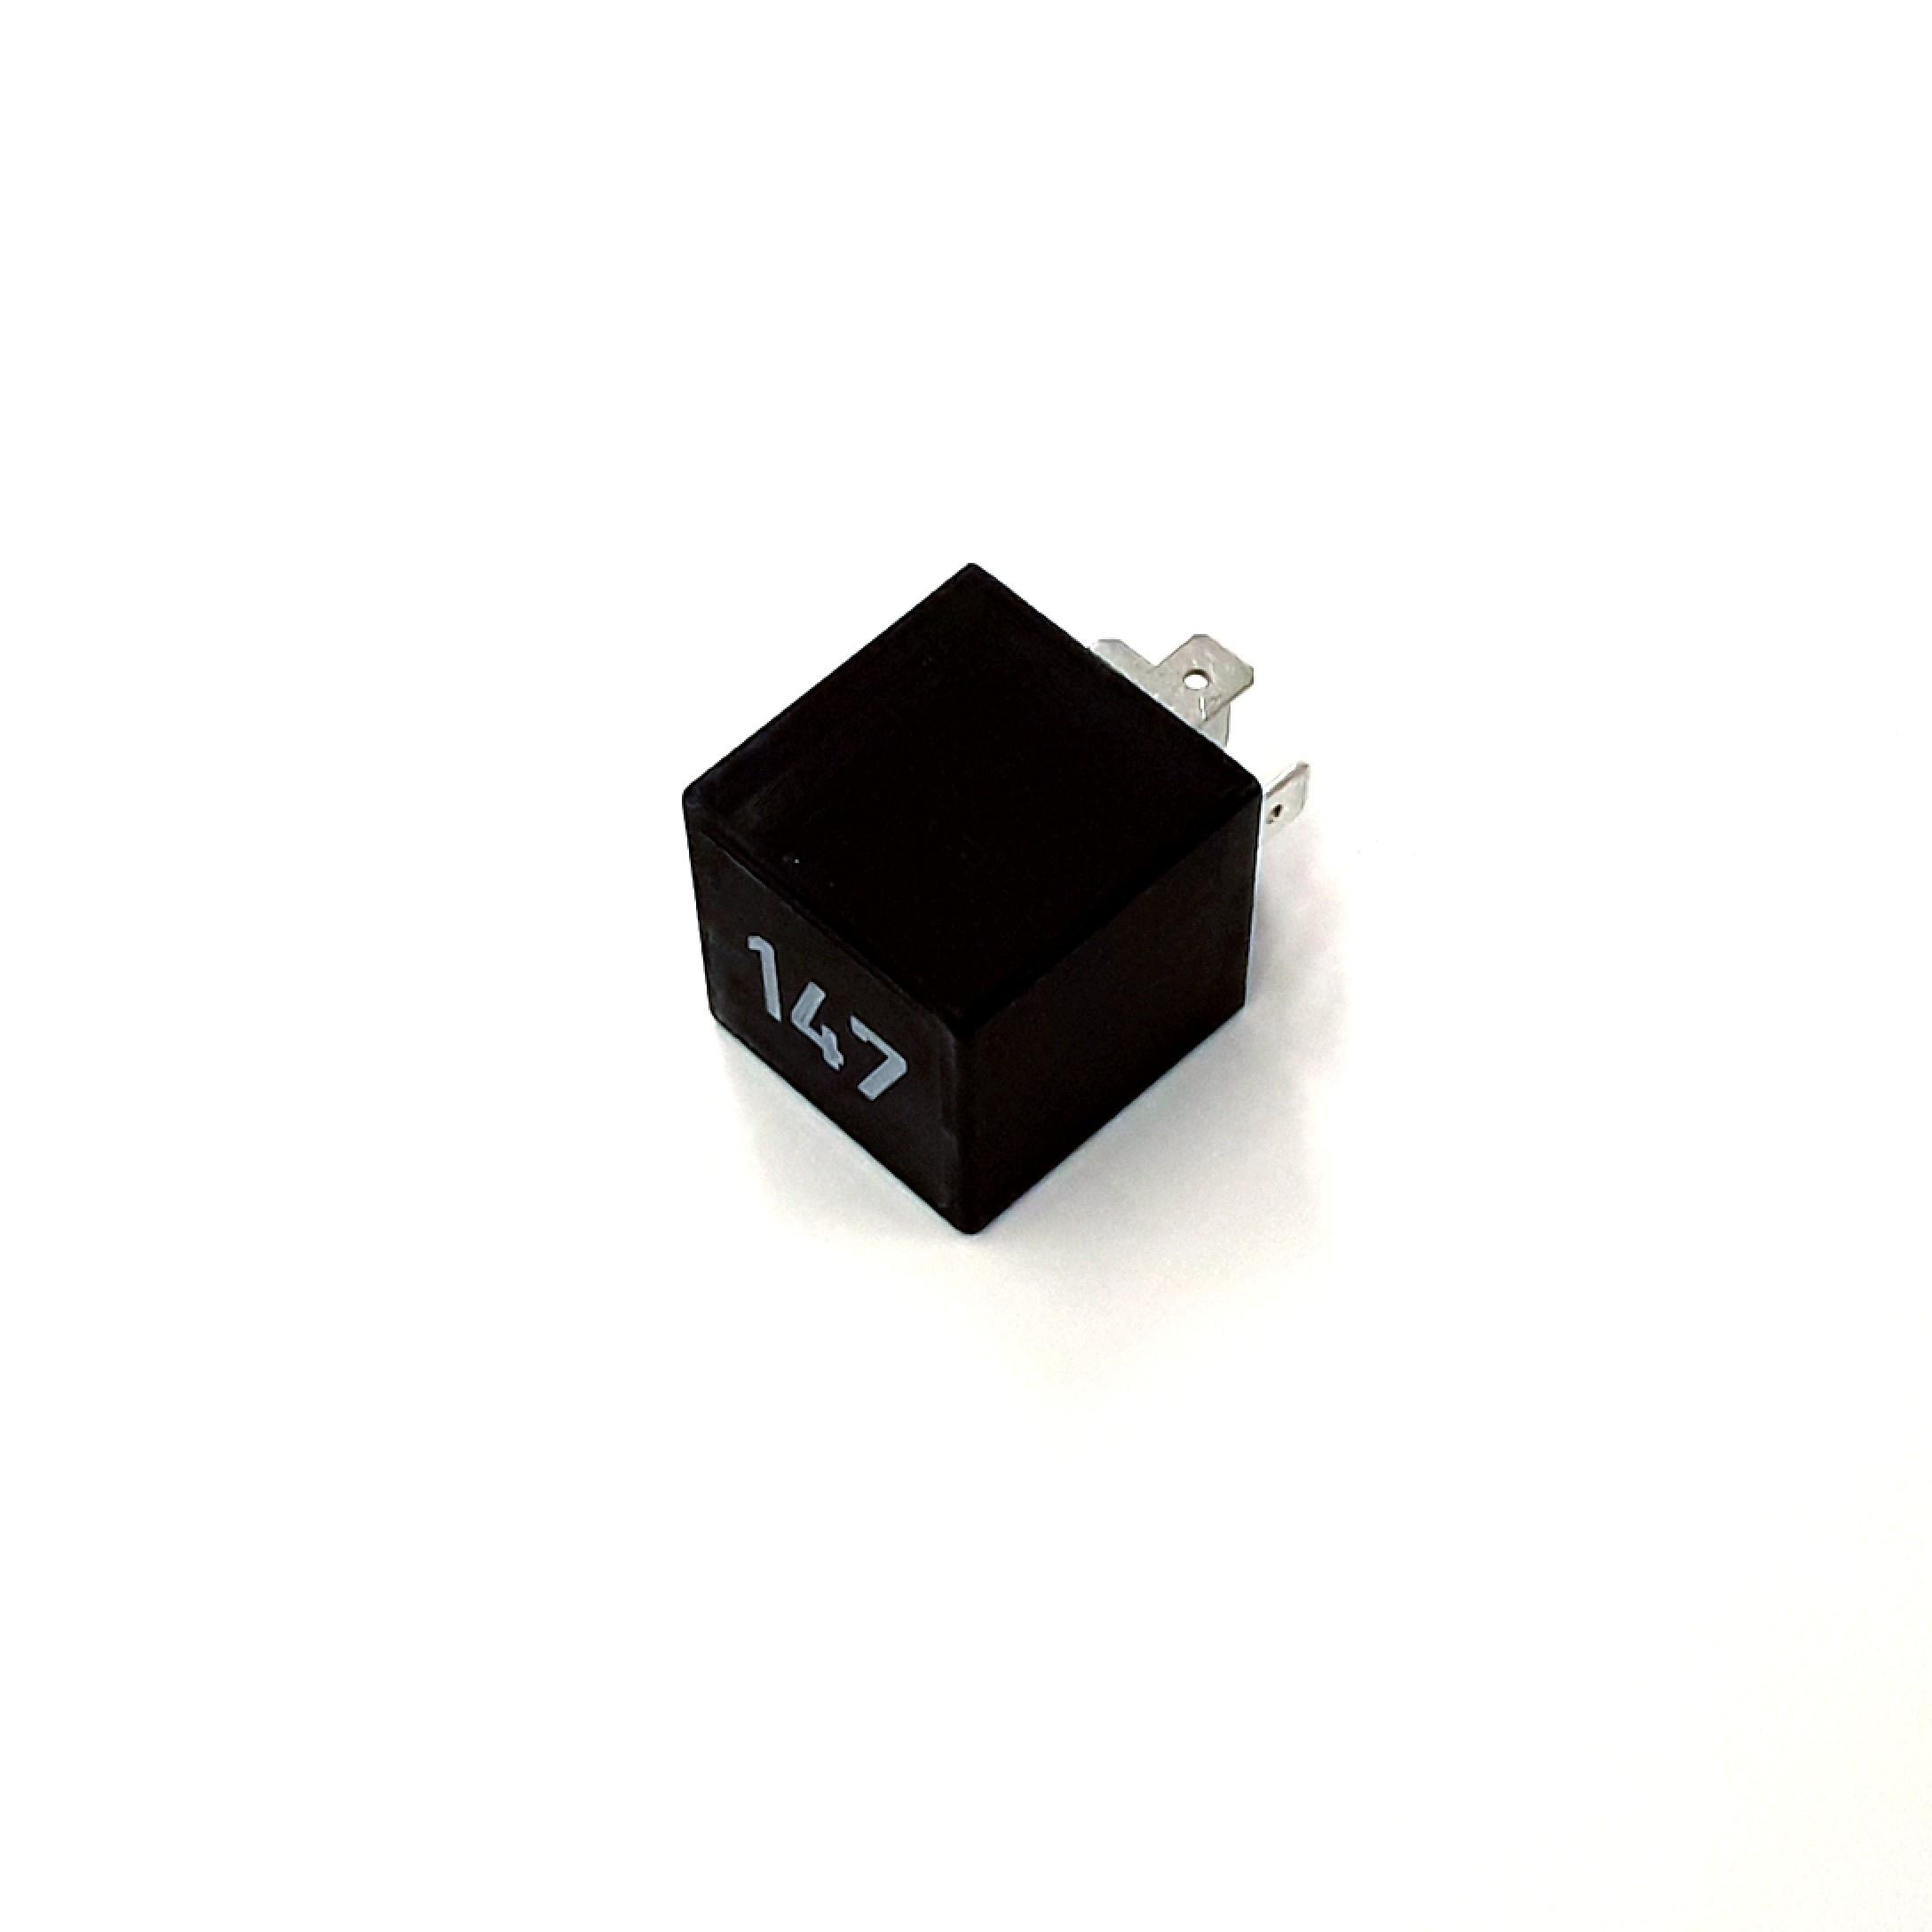 2000 volkswagen cabrio accessory power relay ac fuse box. Black Bedroom Furniture Sets. Home Design Ideas